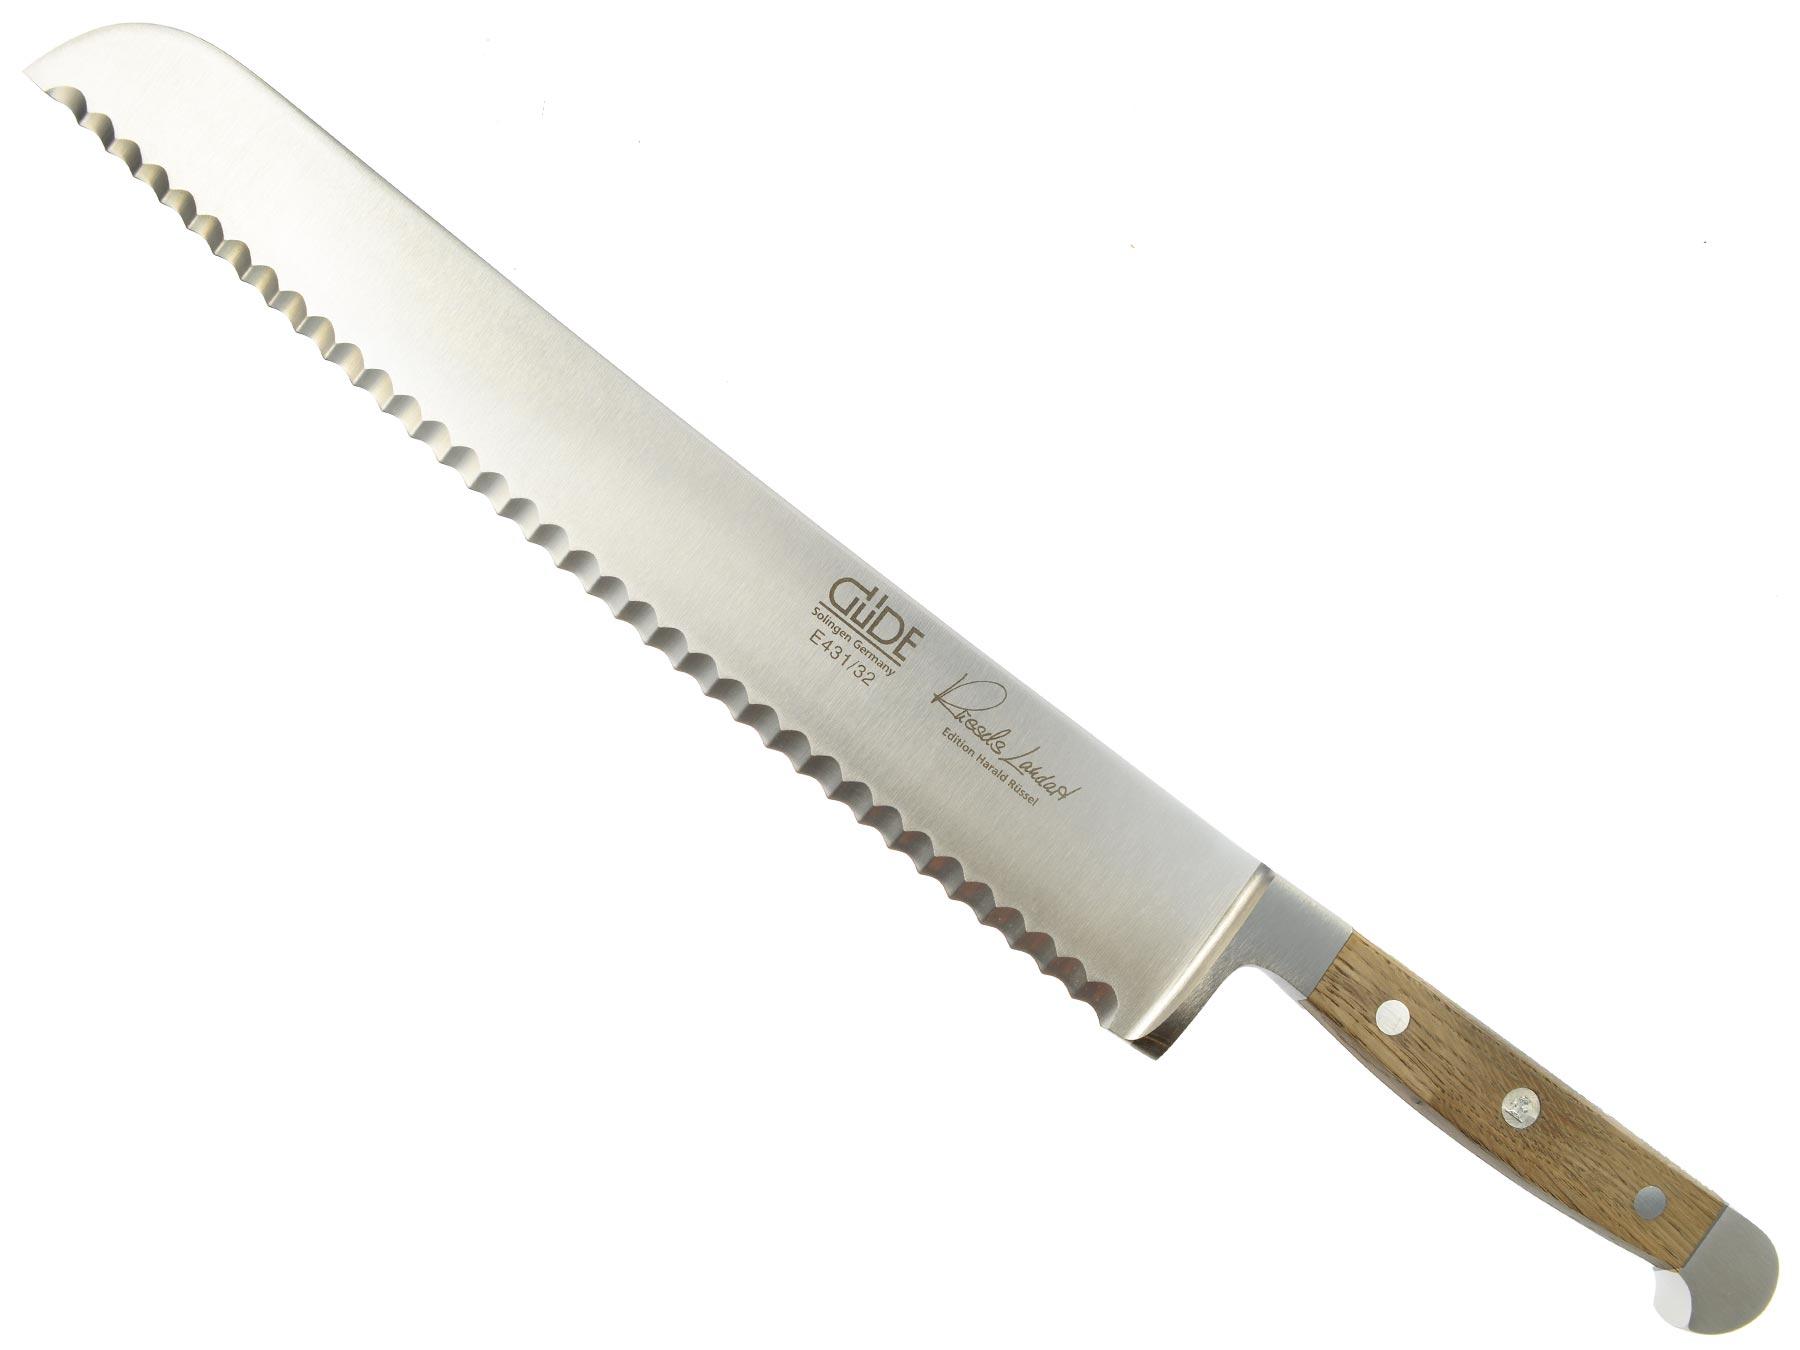 Güde Alpha Faßeiche Brotmesser E431/32L - 32 cm linkshänder Vers